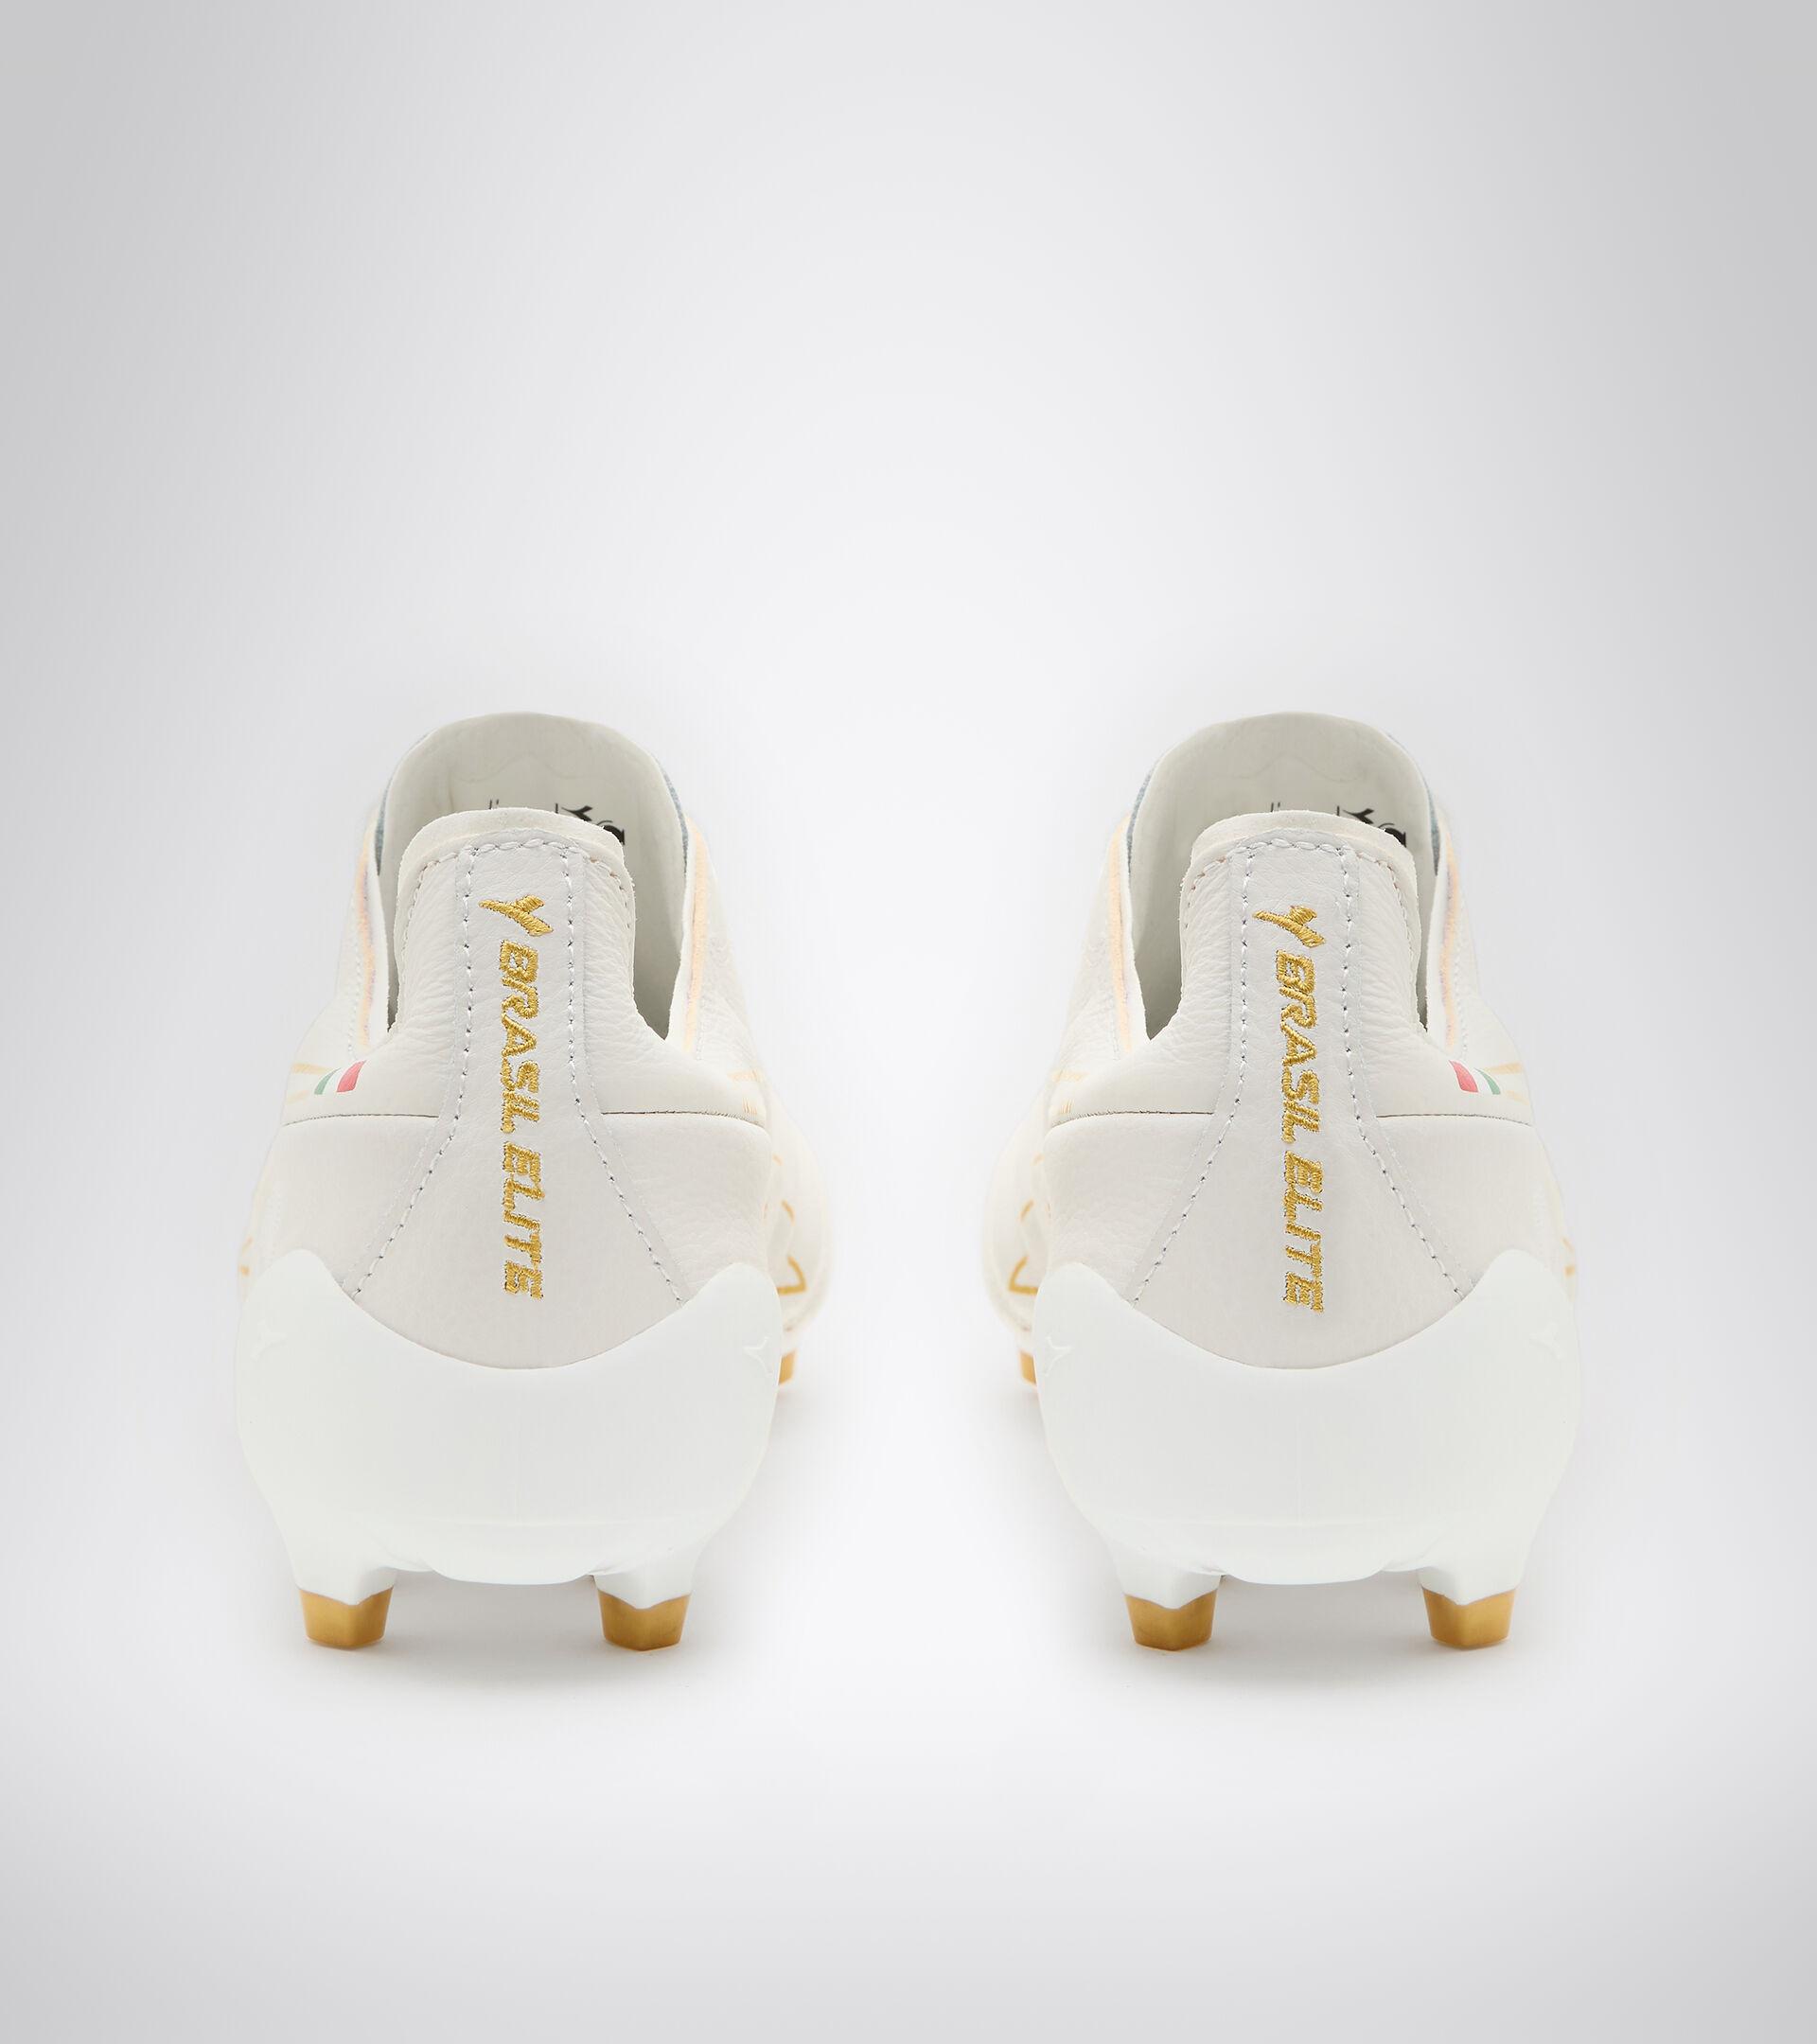 """Made in Italy"" football shoe - ideal for firm ground BRASIL ELITE TECH ITA LPX WHITE/GOLD - Diadora"